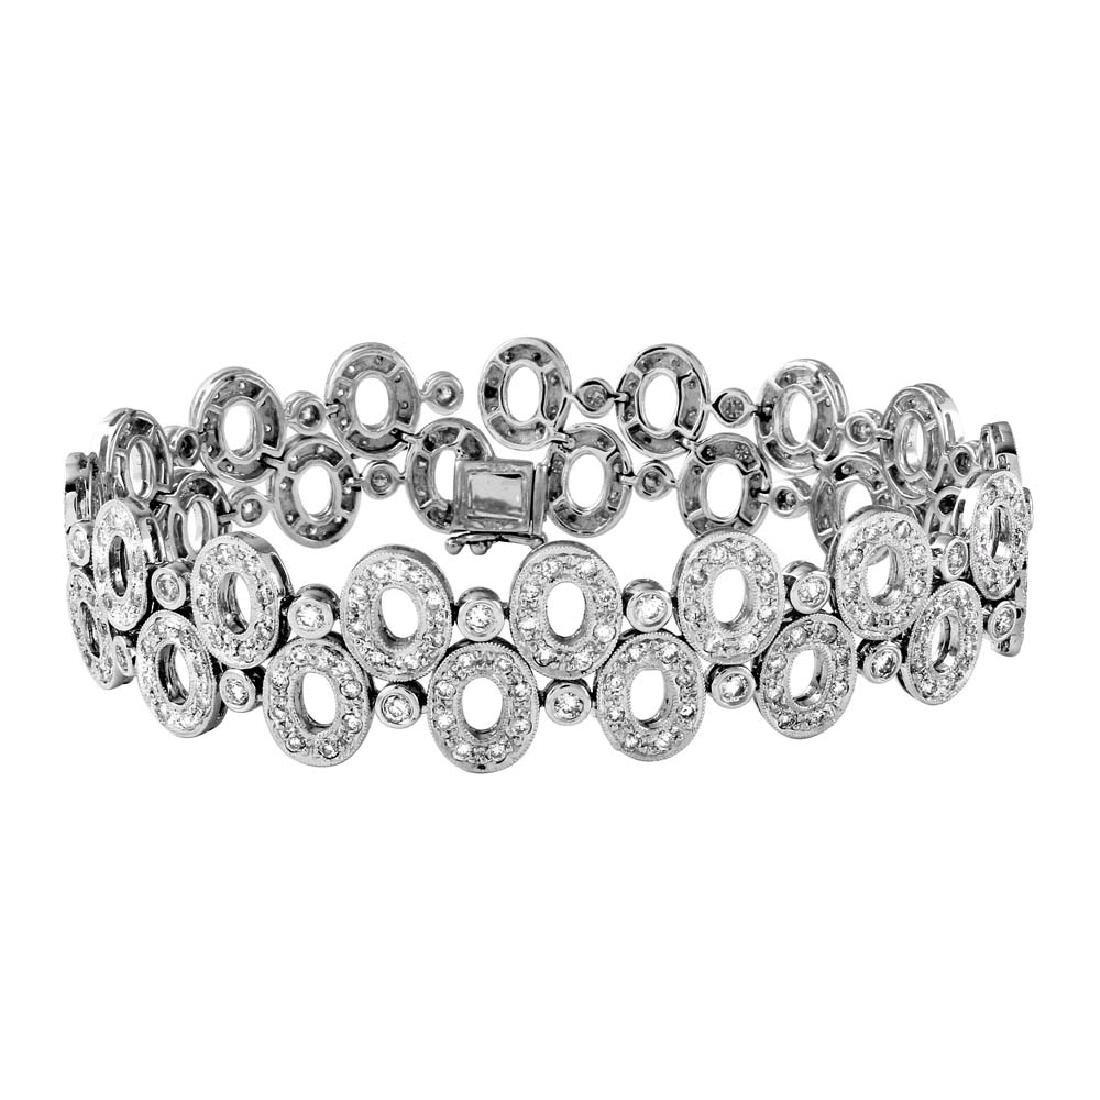 Genuine 4.77 TCW 14K White Gold Ladies Bracelet